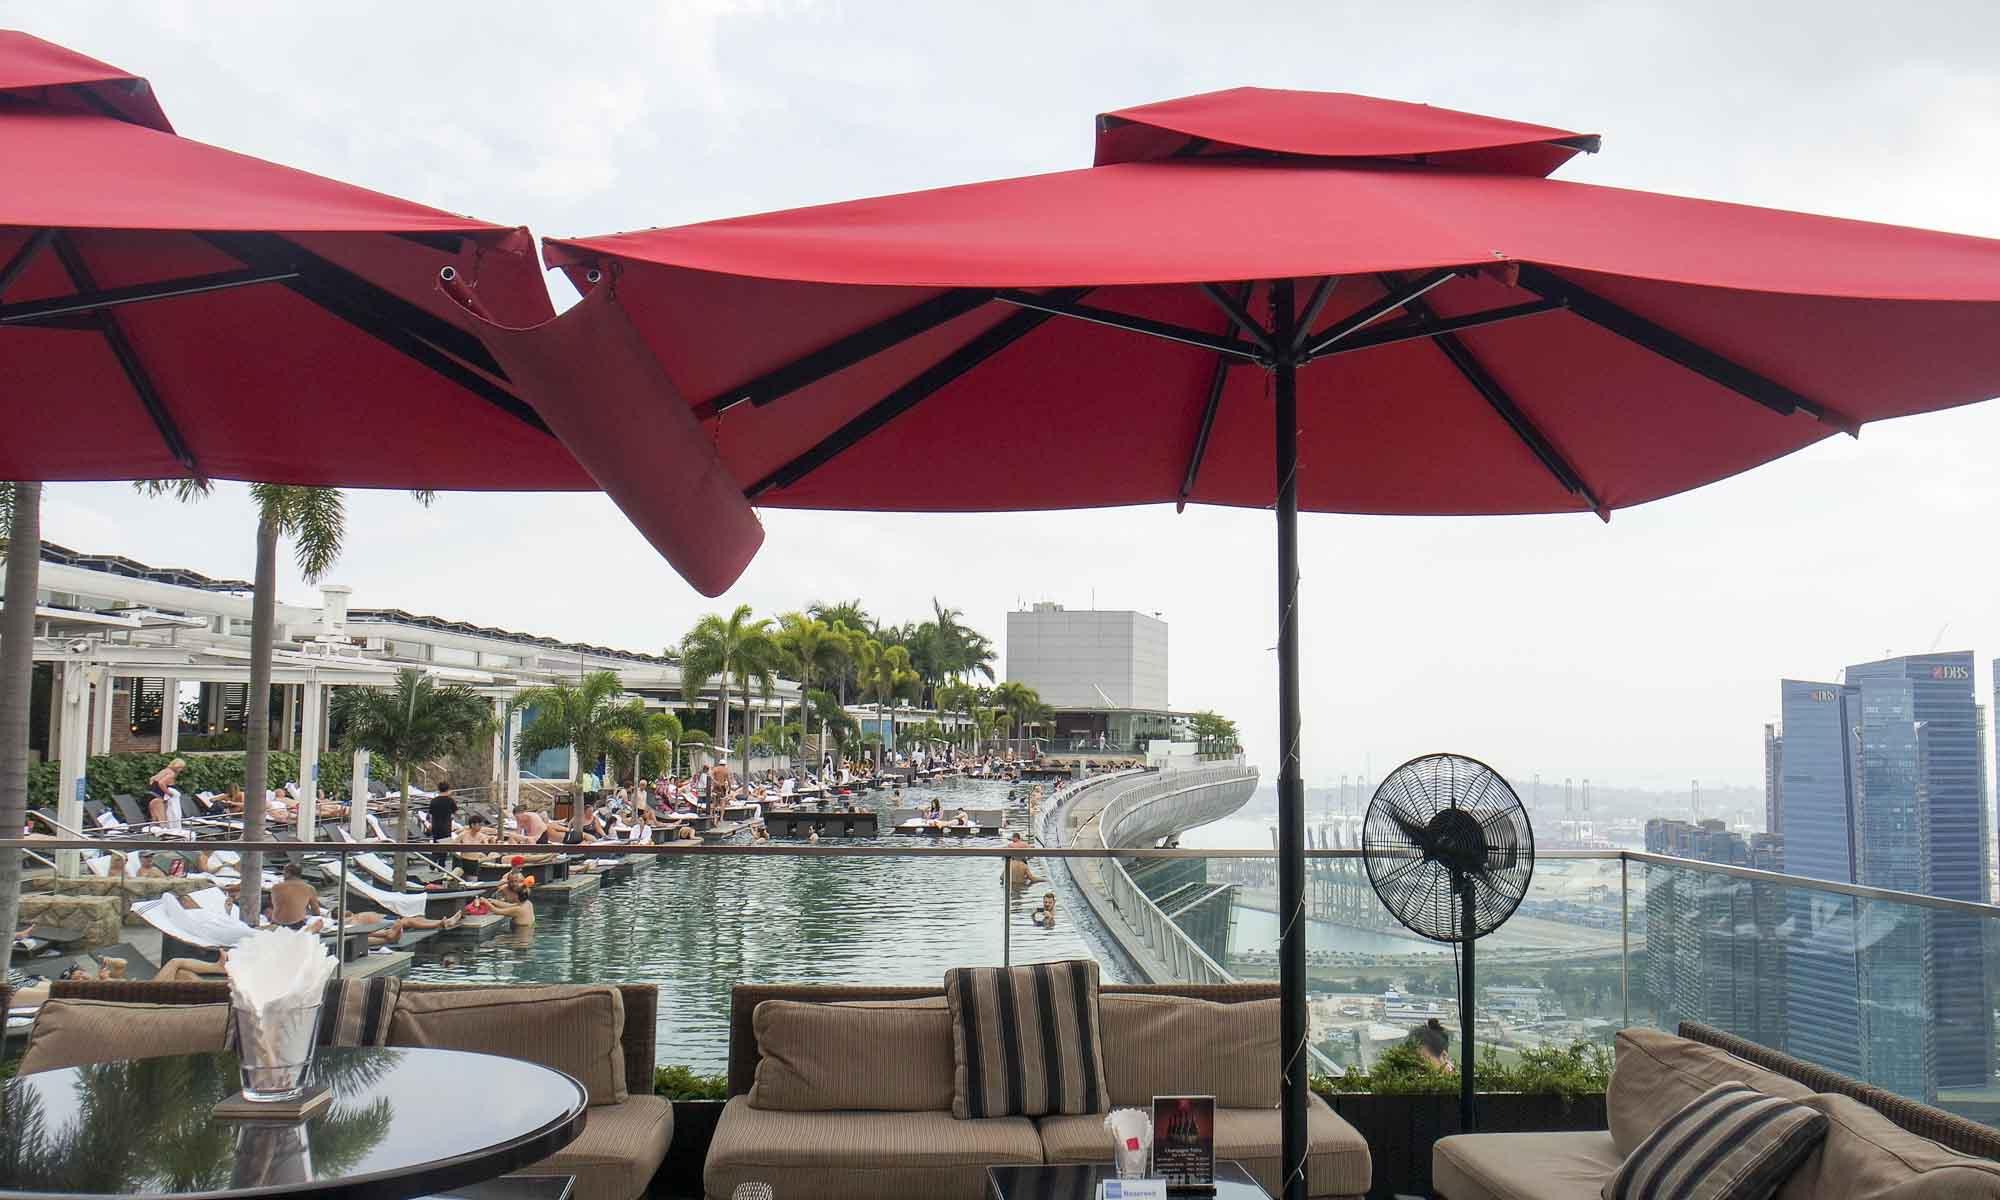 Infinity pool Marina Bay Sands Hotel, Singapore